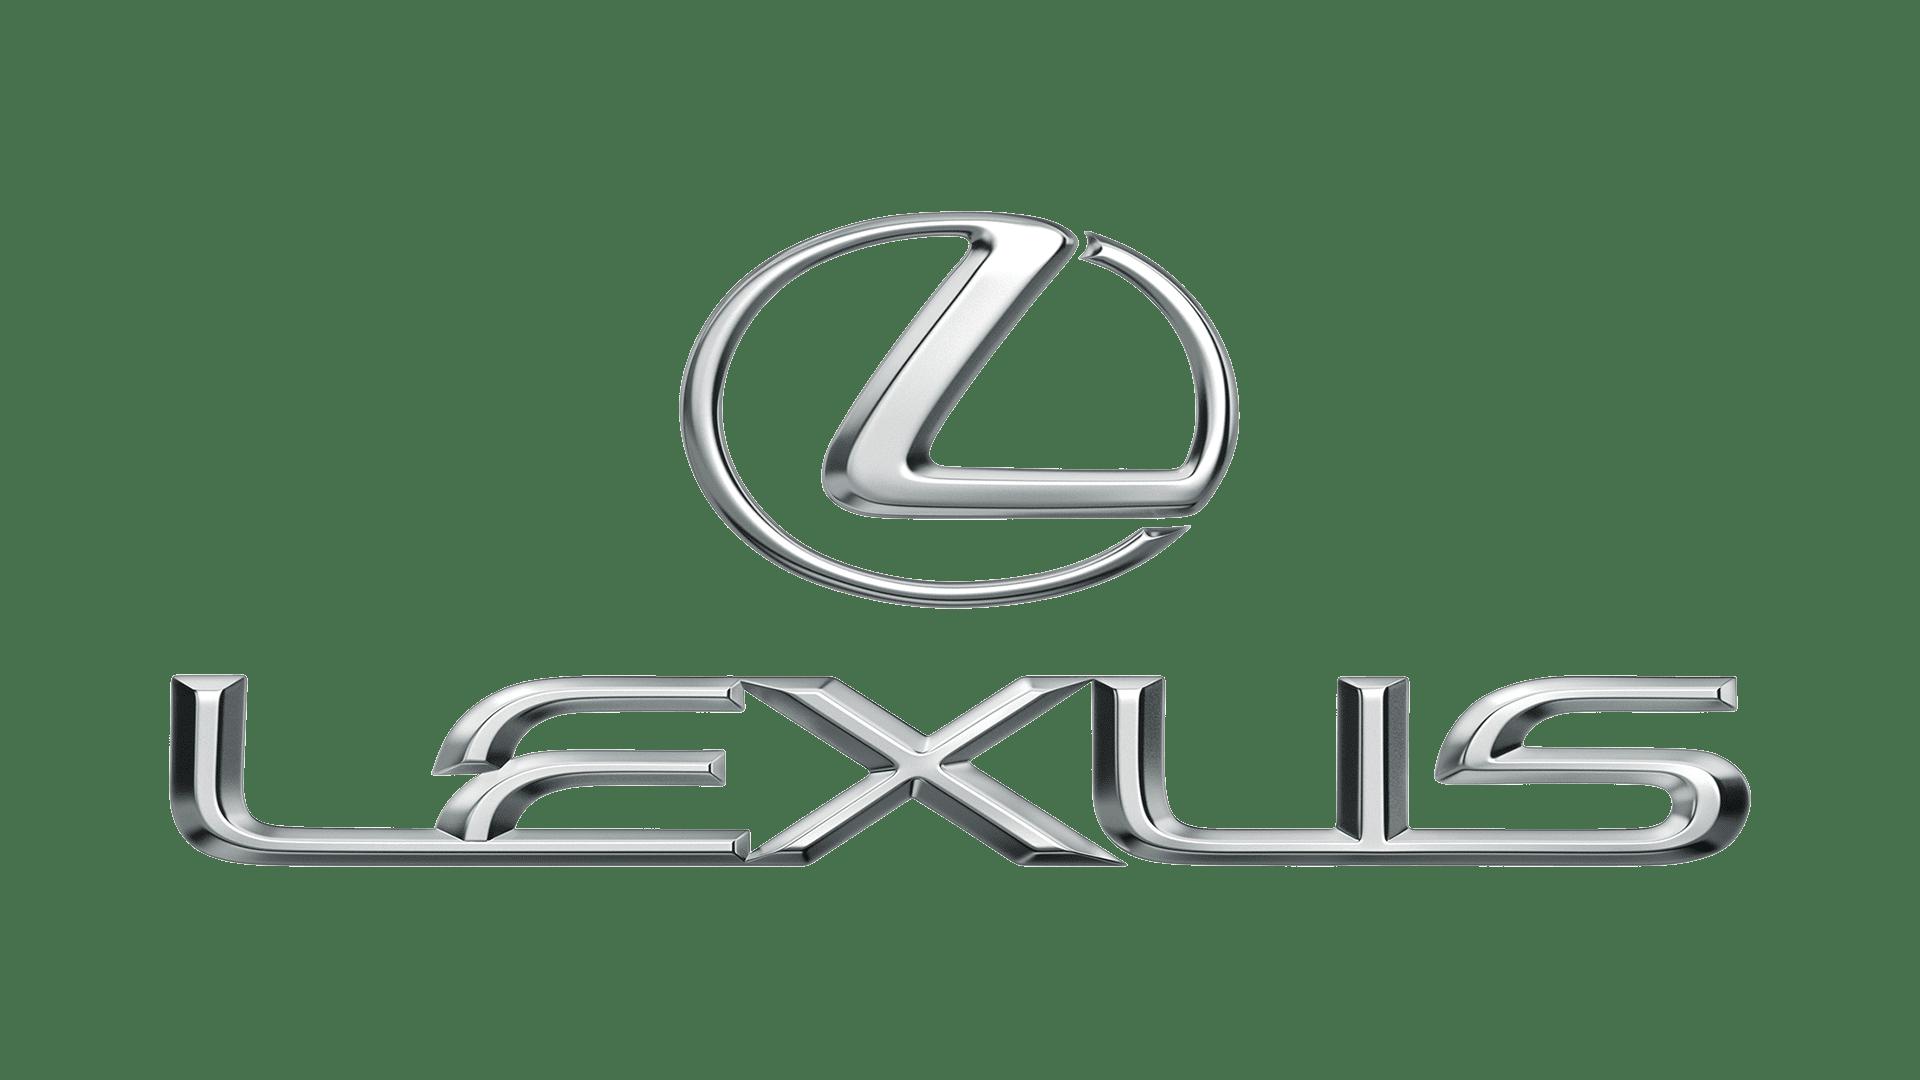 Lexus vin check